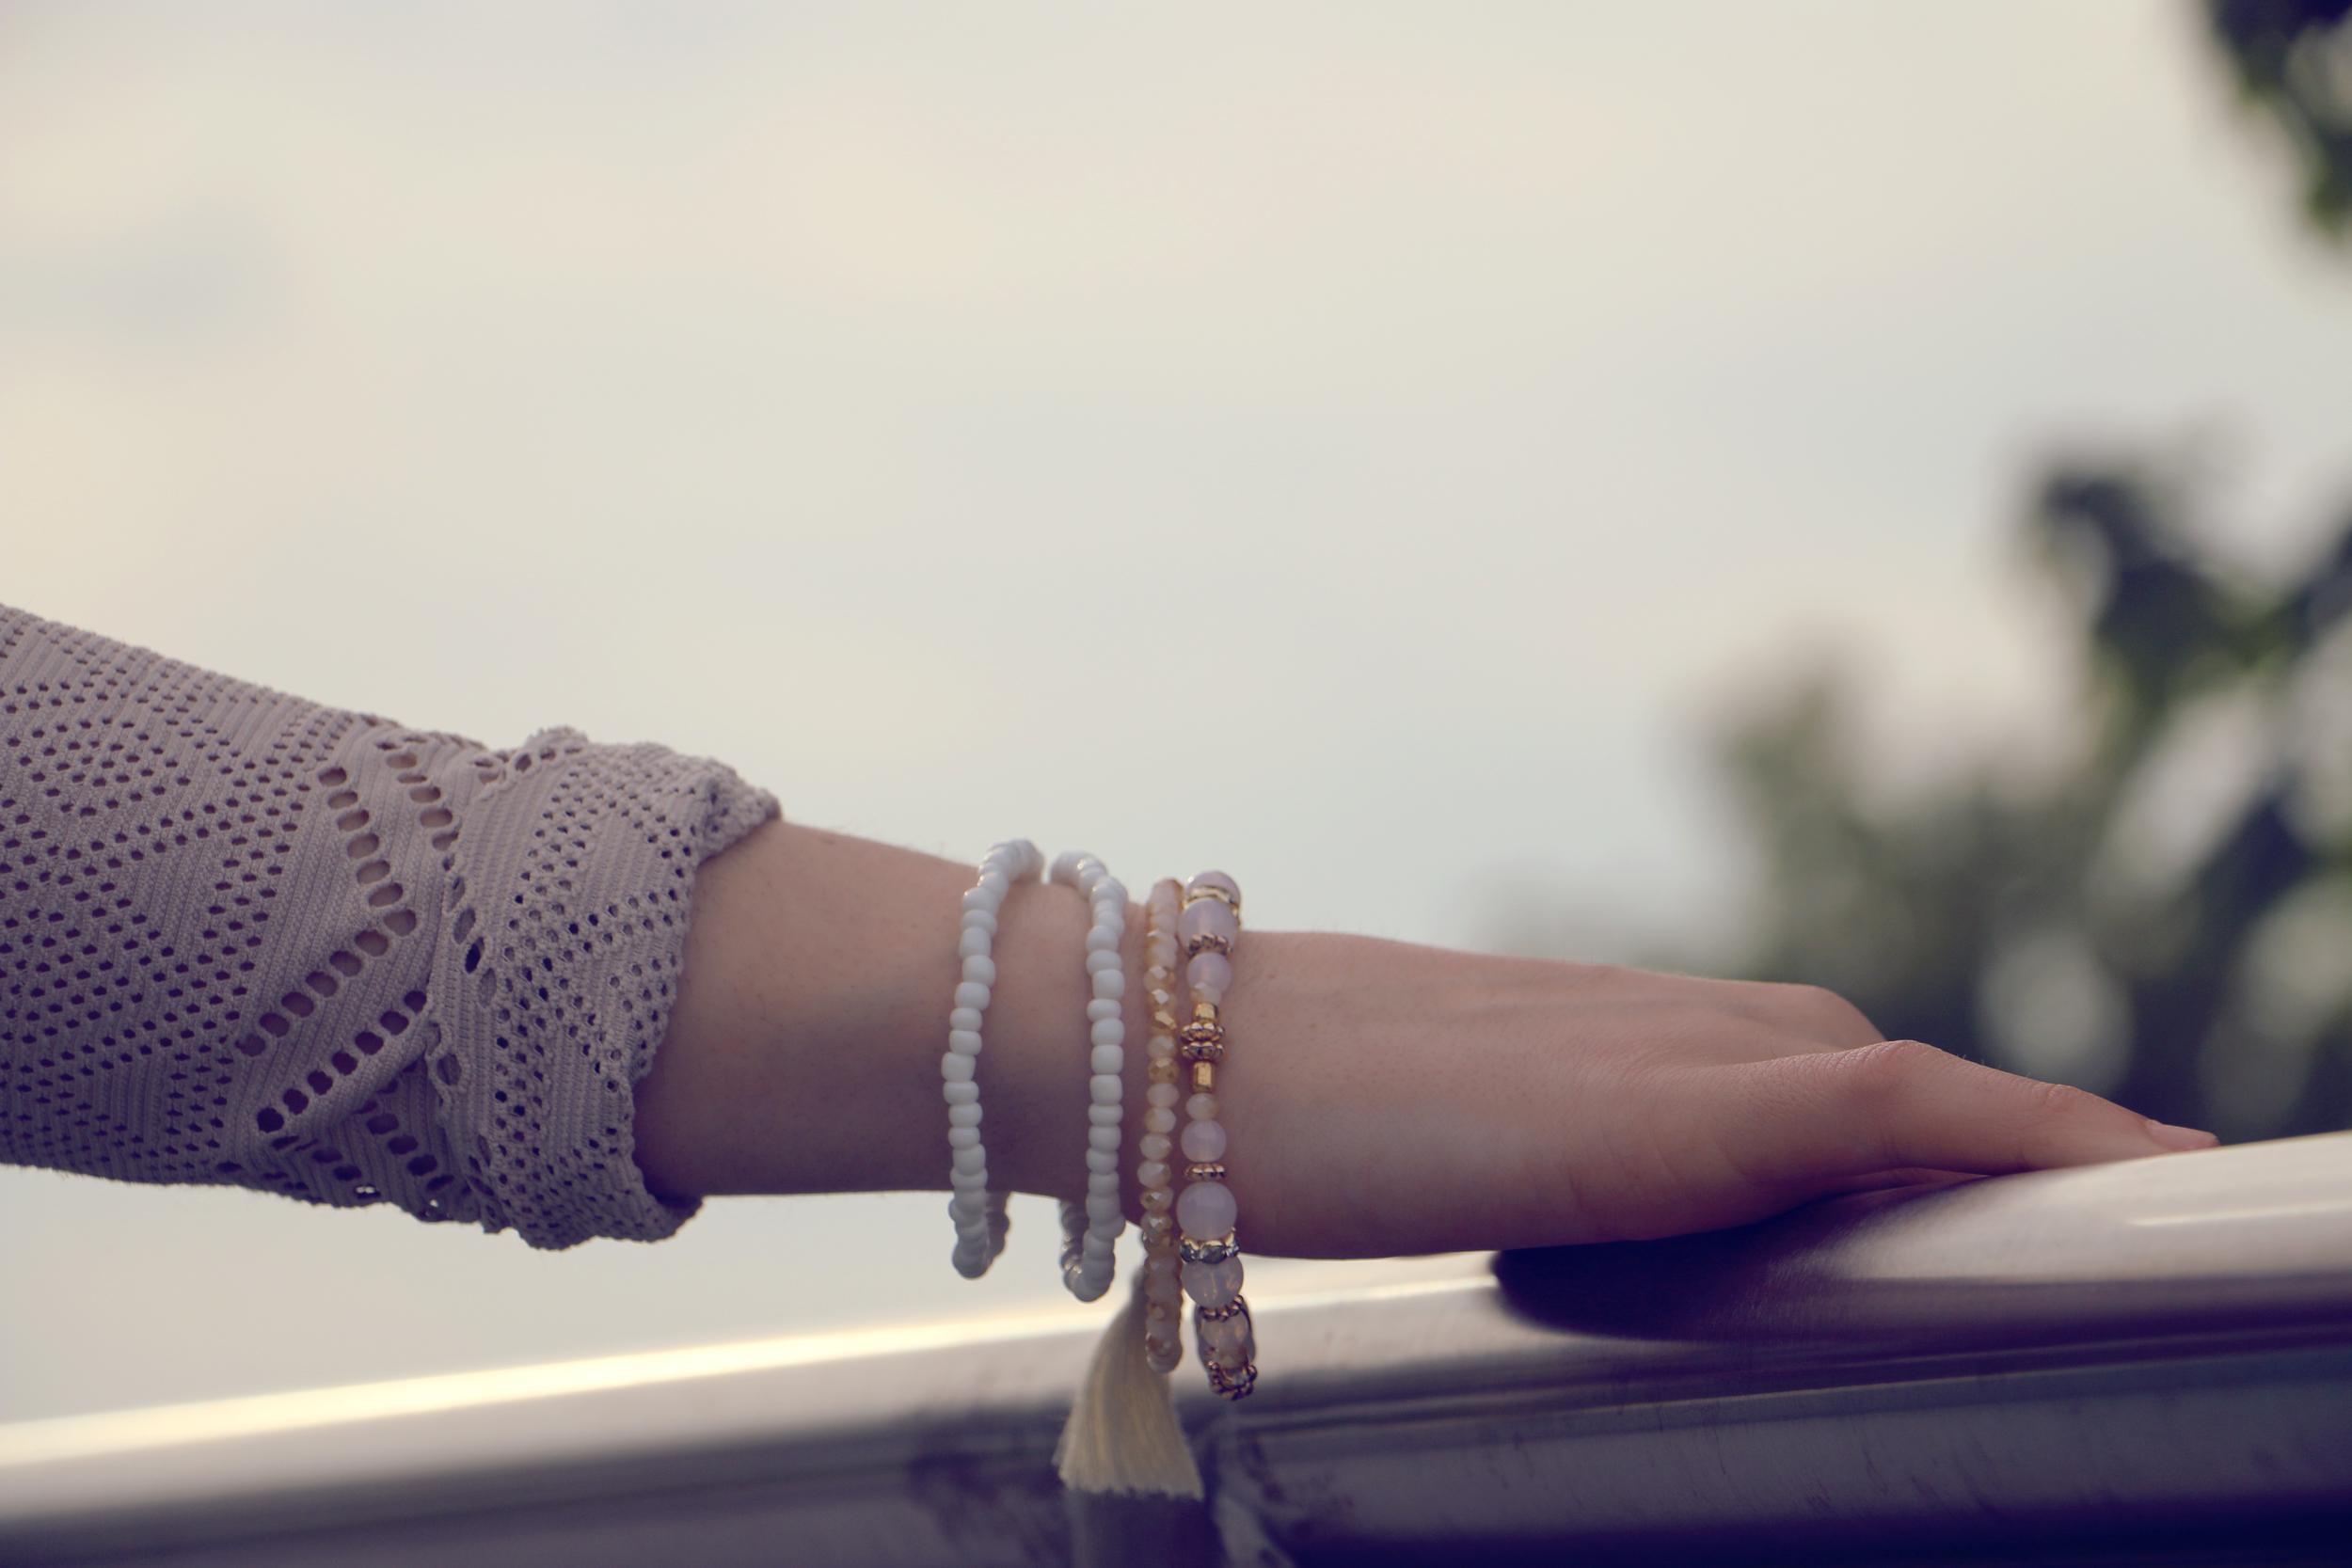 maliqi.lakewoodpark.bracelettes.jpg